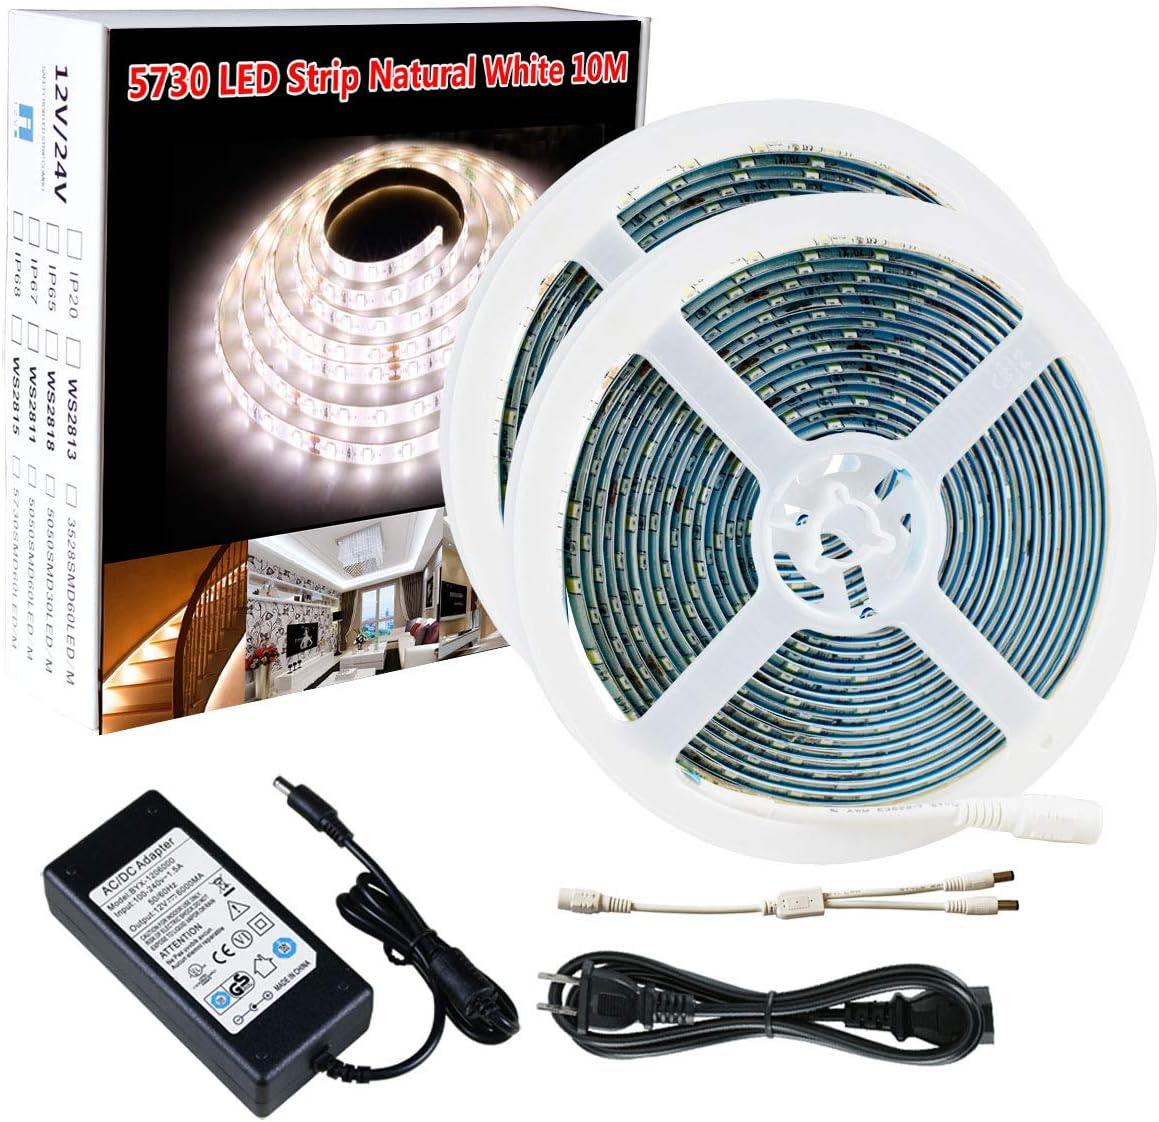 10M 600LED Waterproof 12V Light Strip Dimmer 3528 SMD Cool White Indoor Outdoor